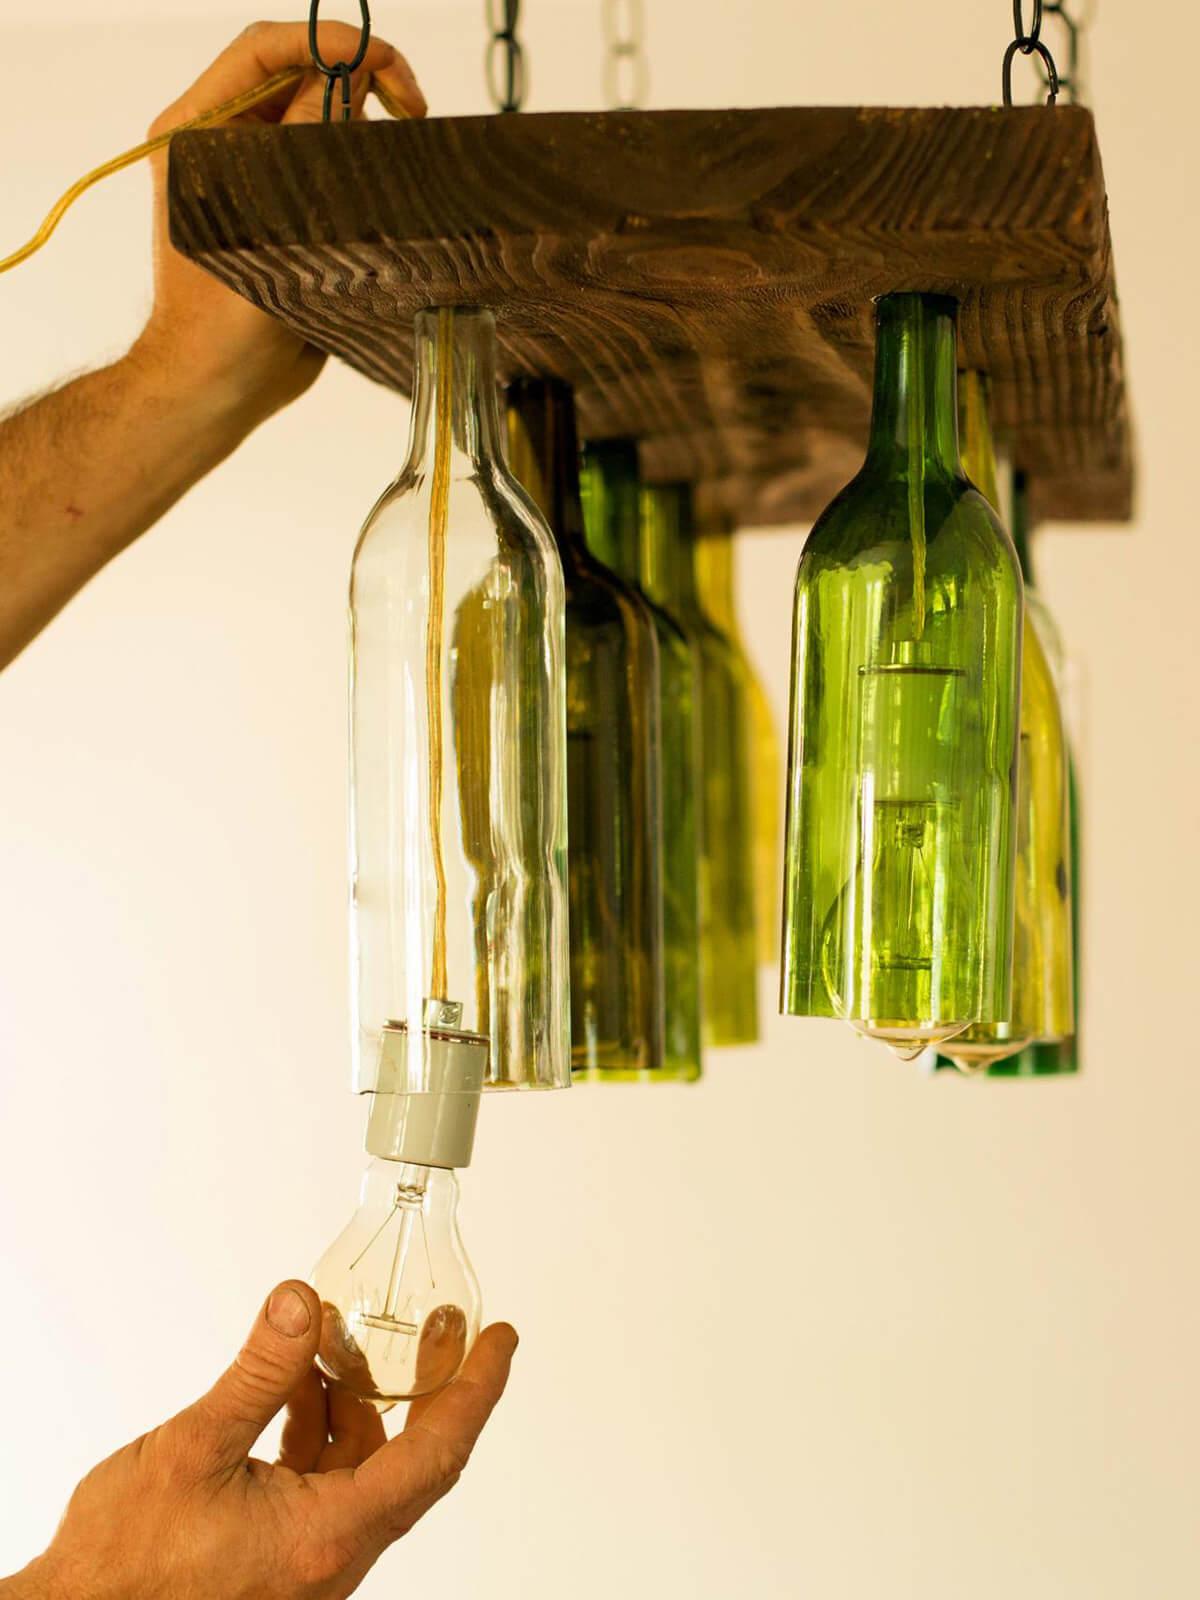 manualidades para reciclar botellas de vino 14